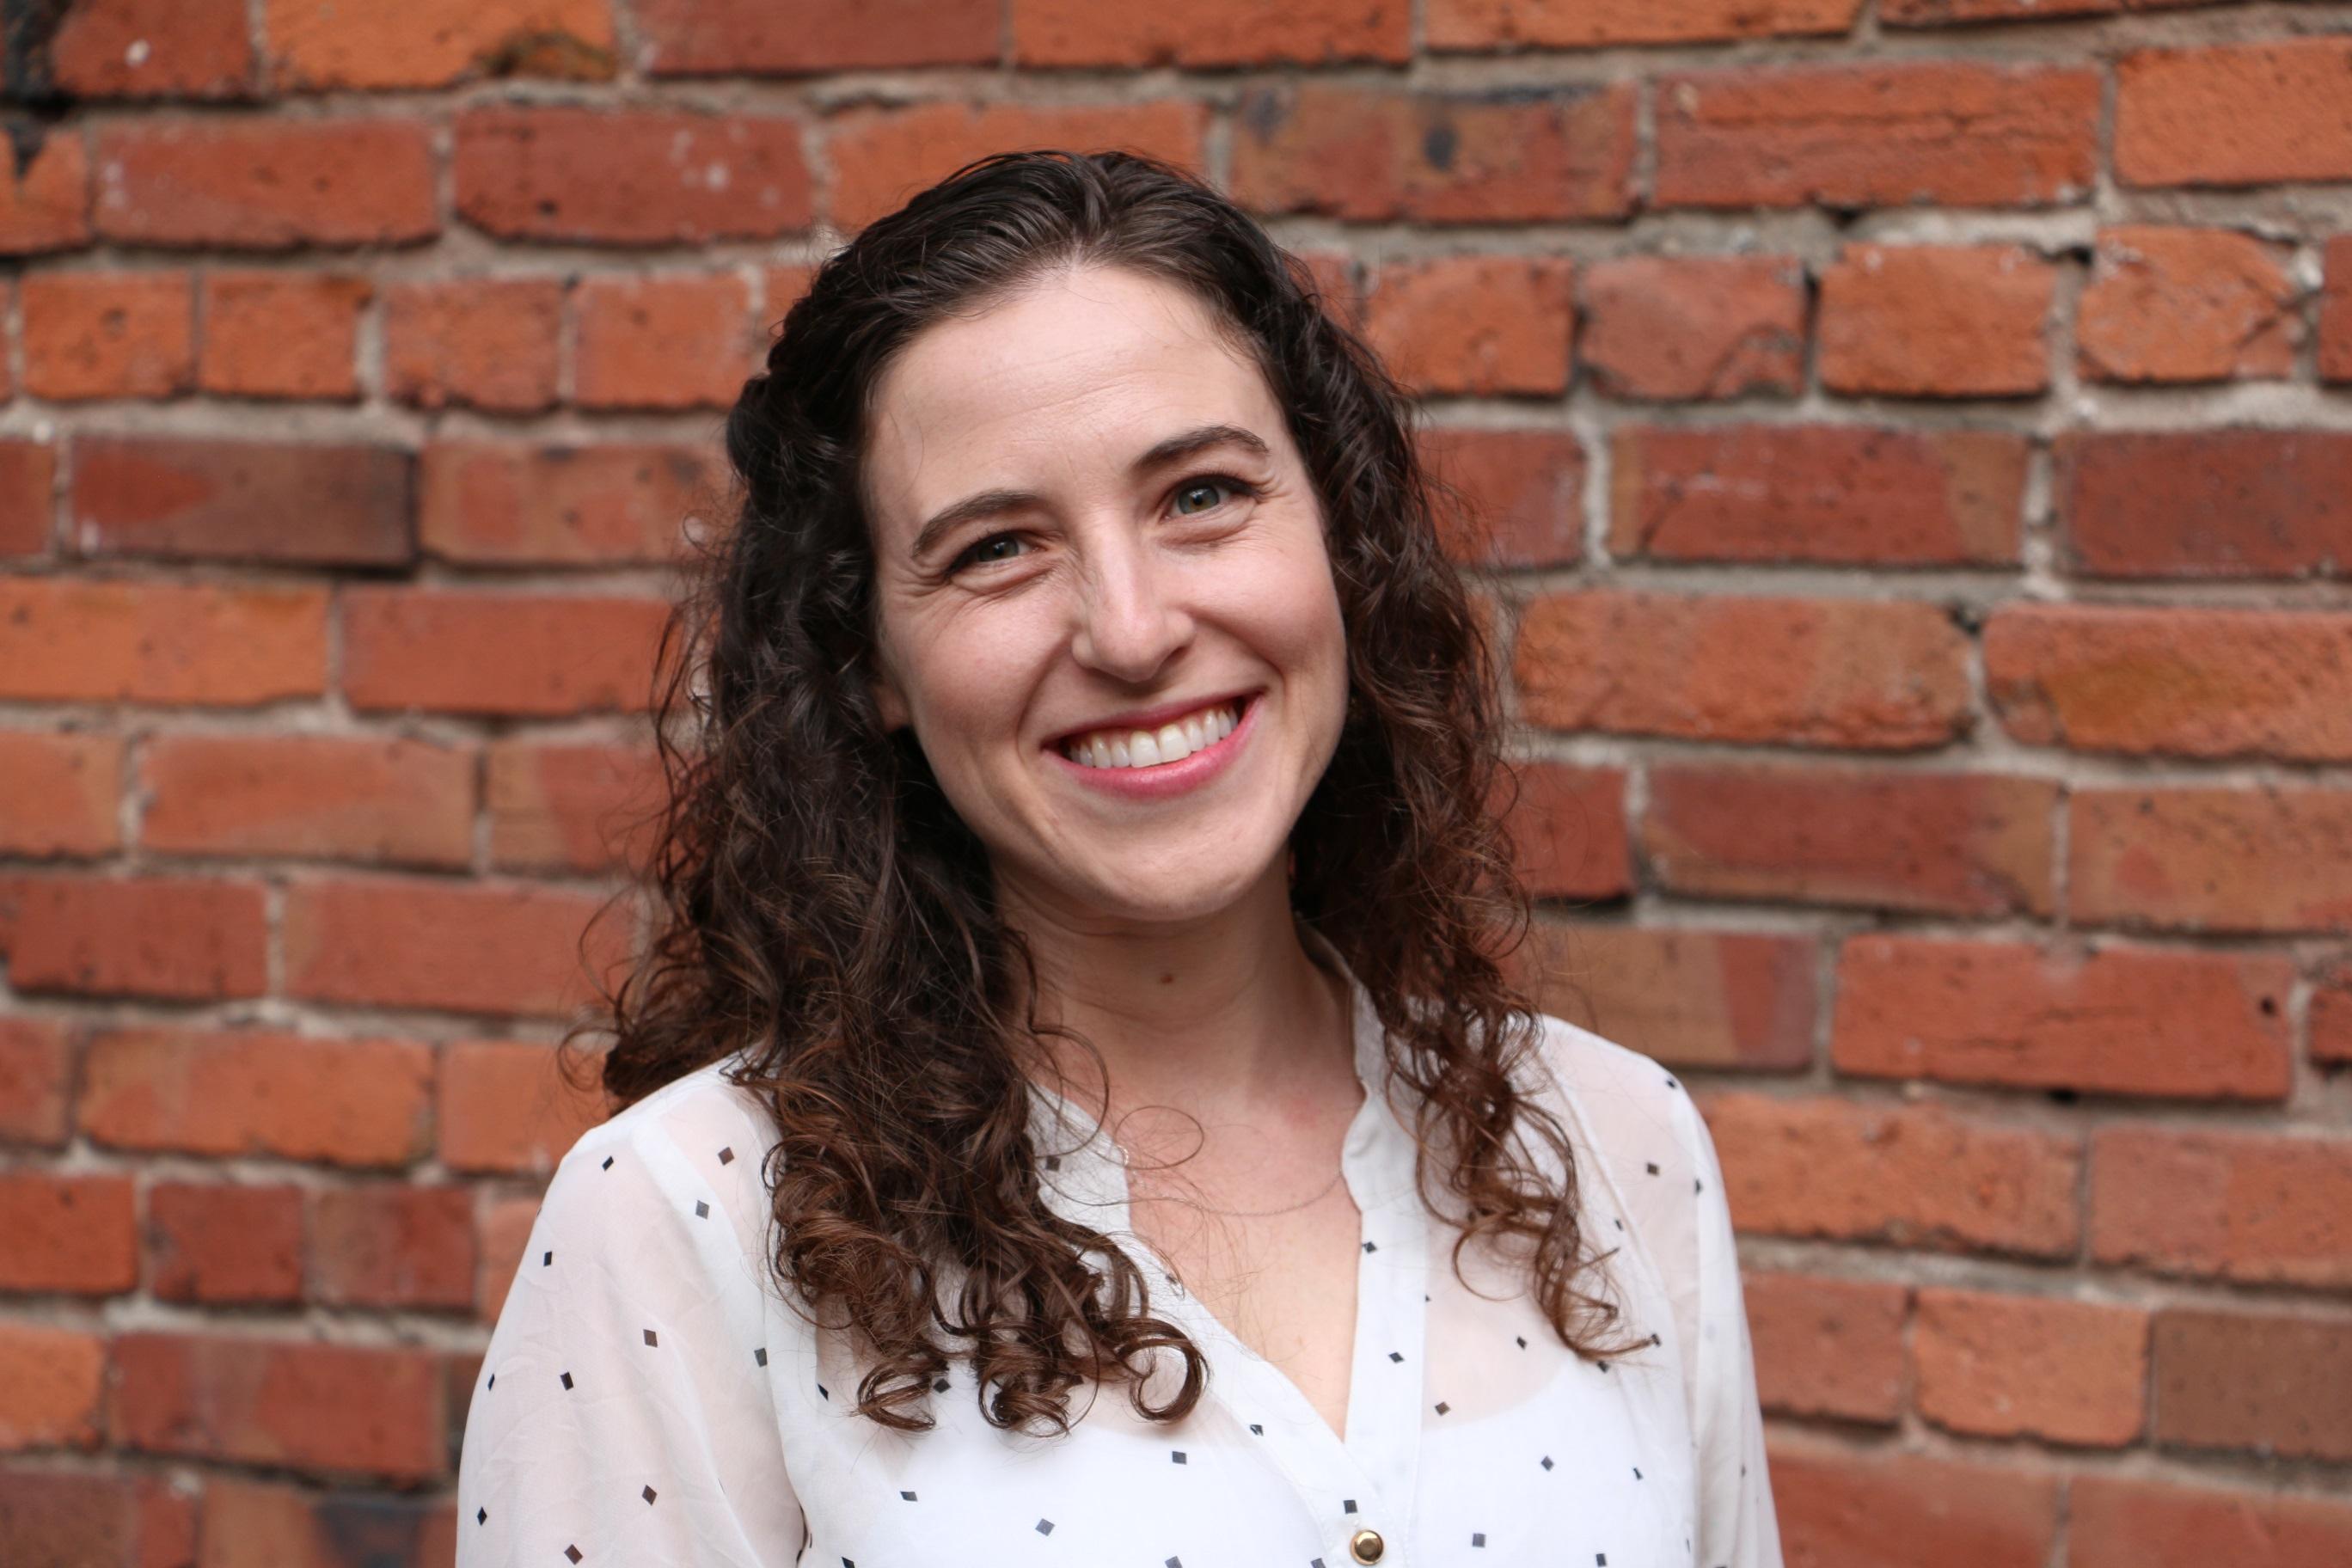 Kara Zucker